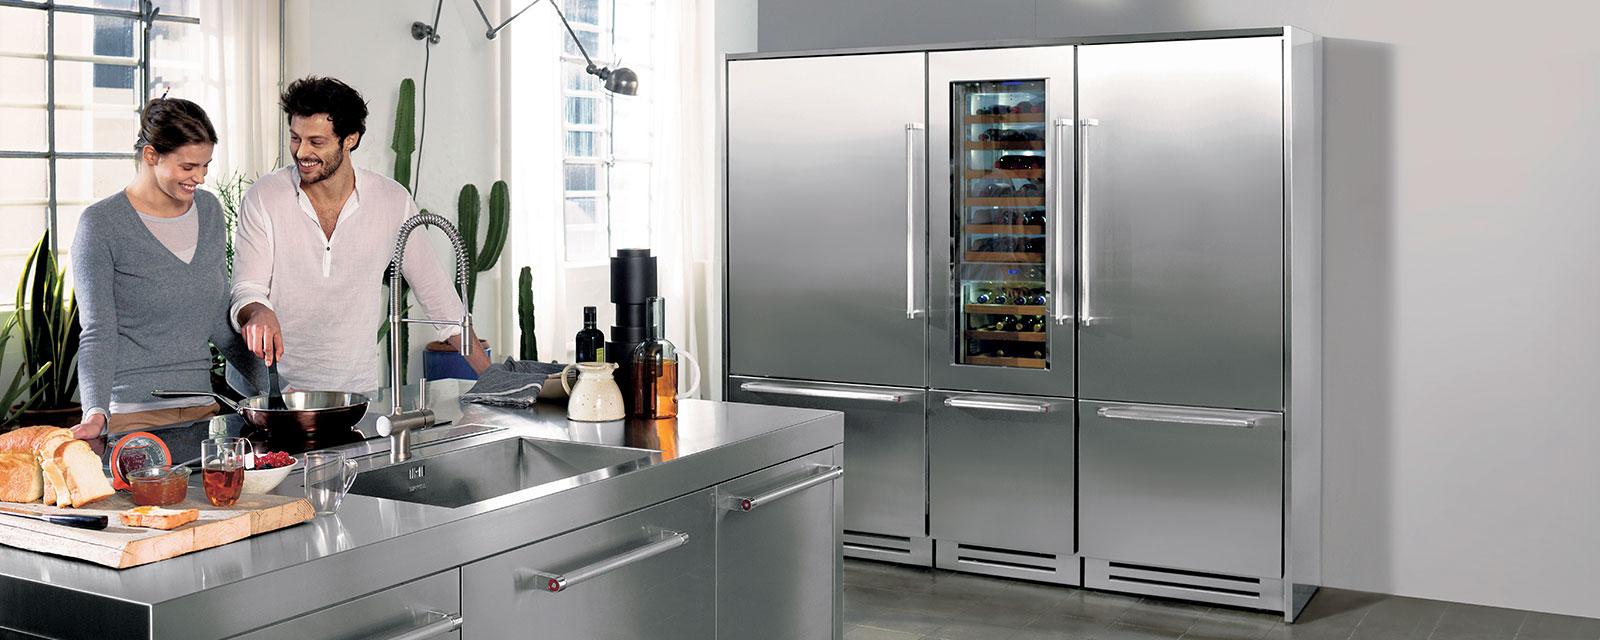 vertigo collection integrierte k hlkombi 90 cm kczcx 20901l offizielle website von kitchenaid. Black Bedroom Furniture Sets. Home Design Ideas